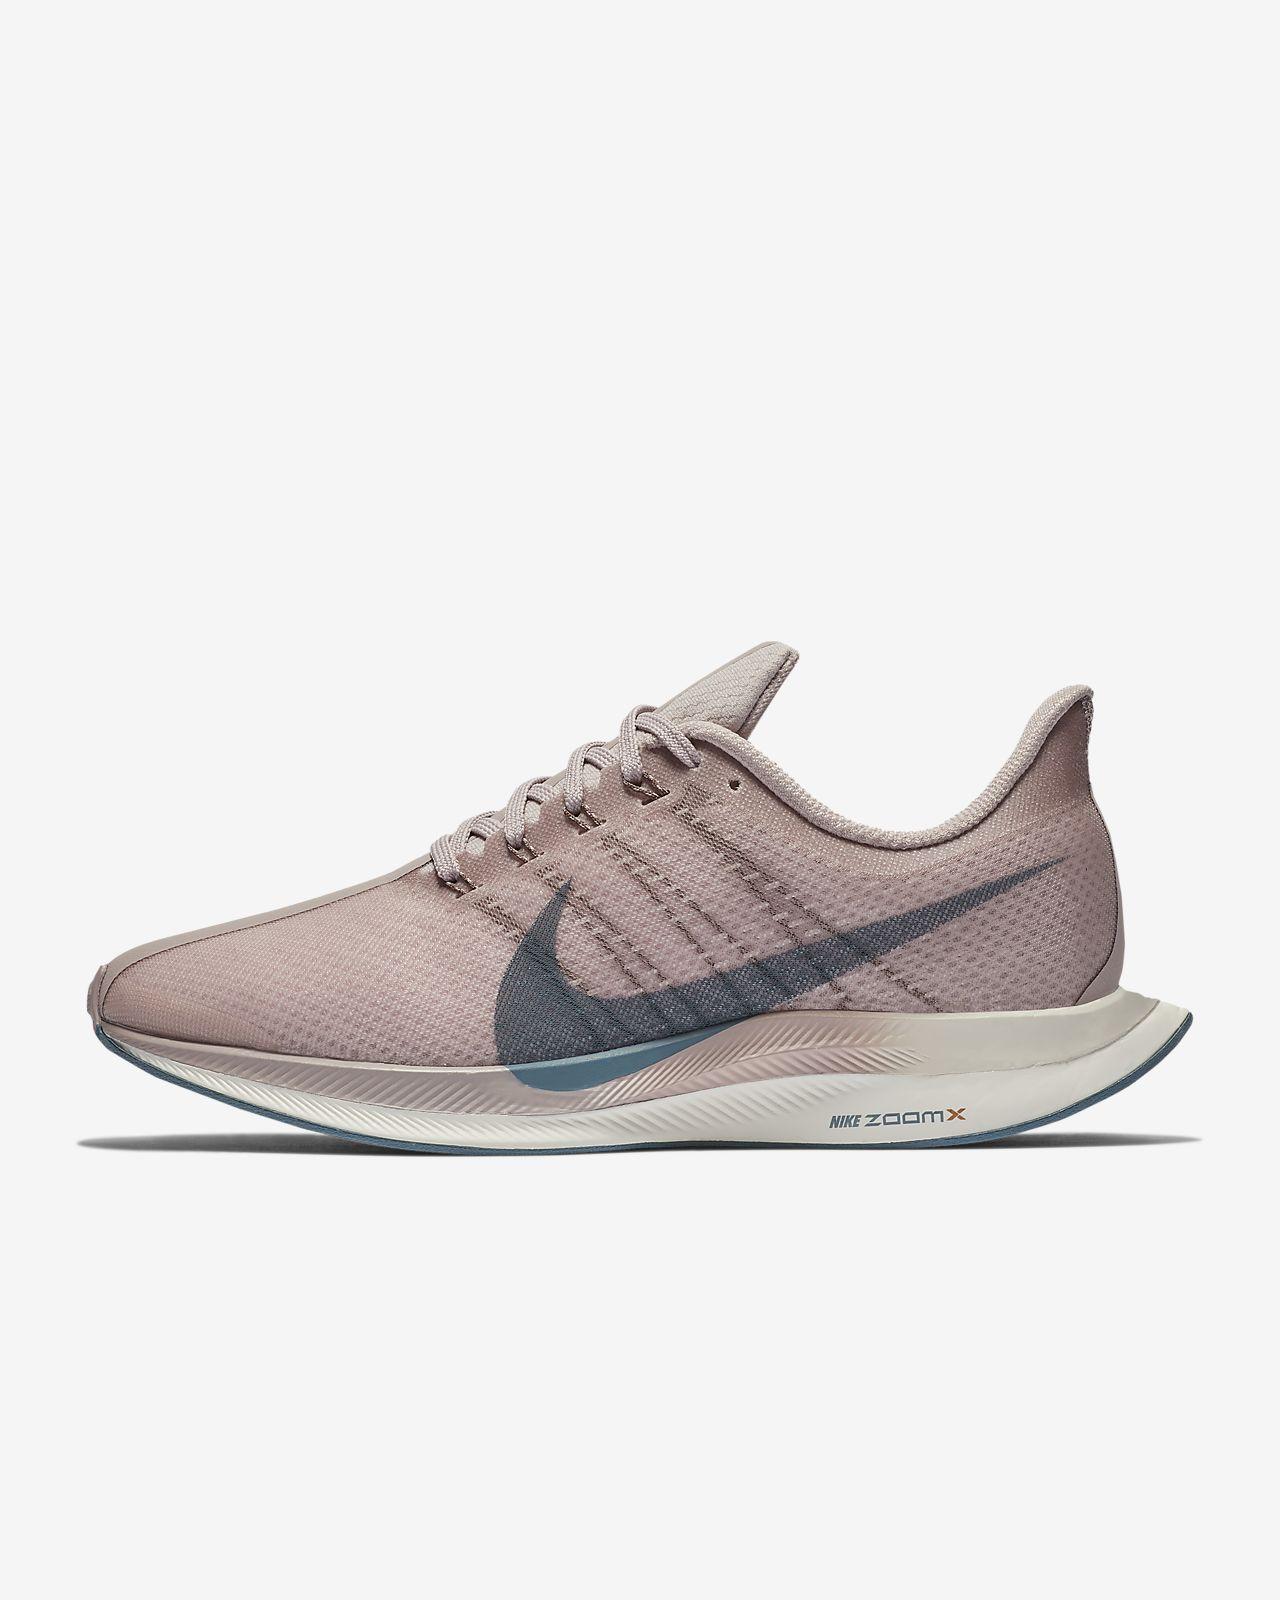 d2b8bddd83bd7 Nike Zoom Pegasus Turbo Women s Running Shoe. Nike.com DK